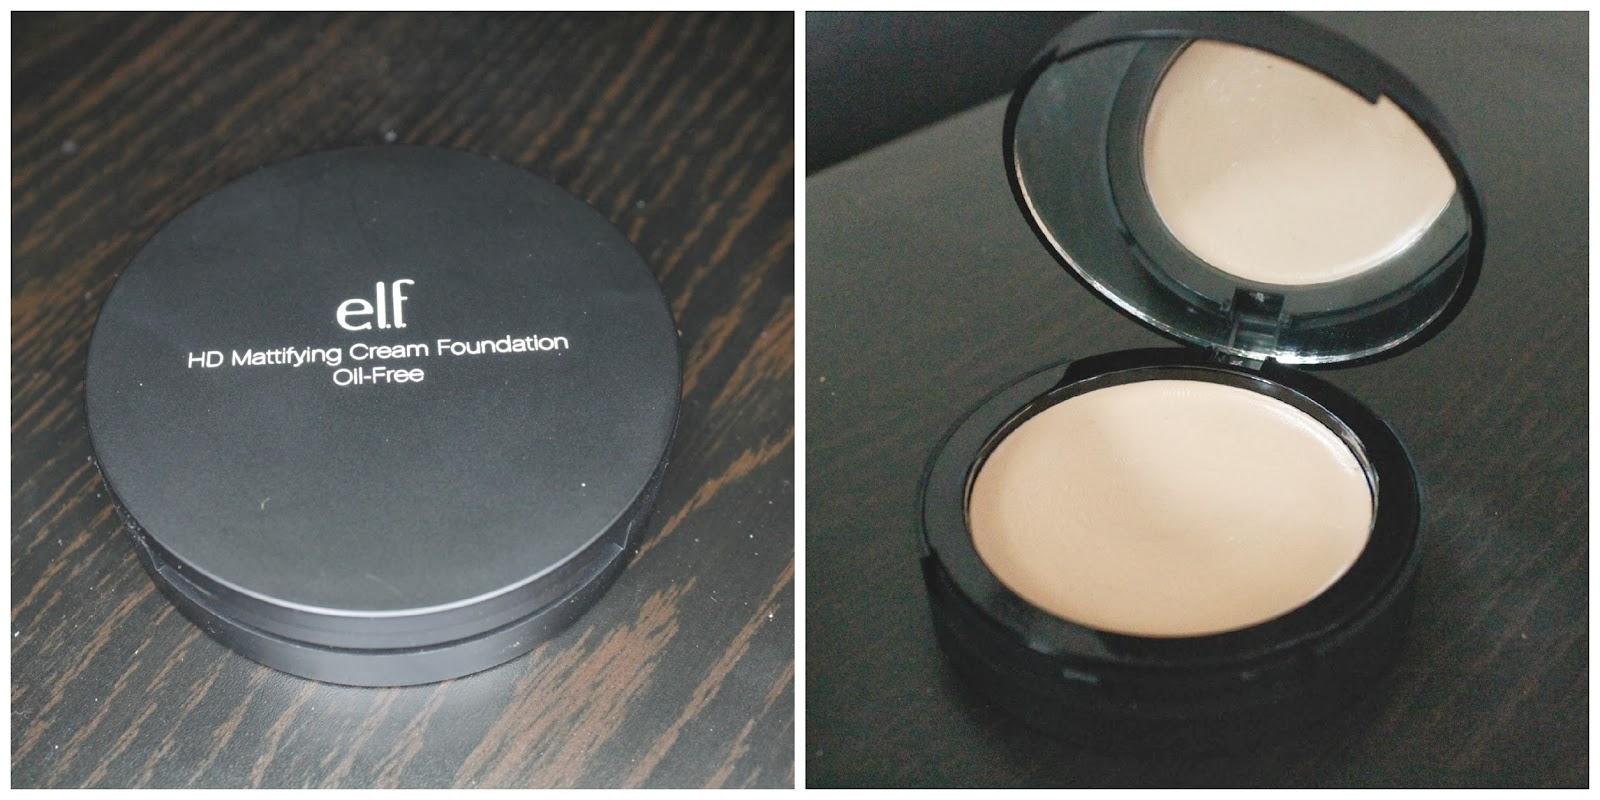 Makeup Fashion Royalty Review Elf Studio Hd Mattifying Cream Cosmetics Foundation